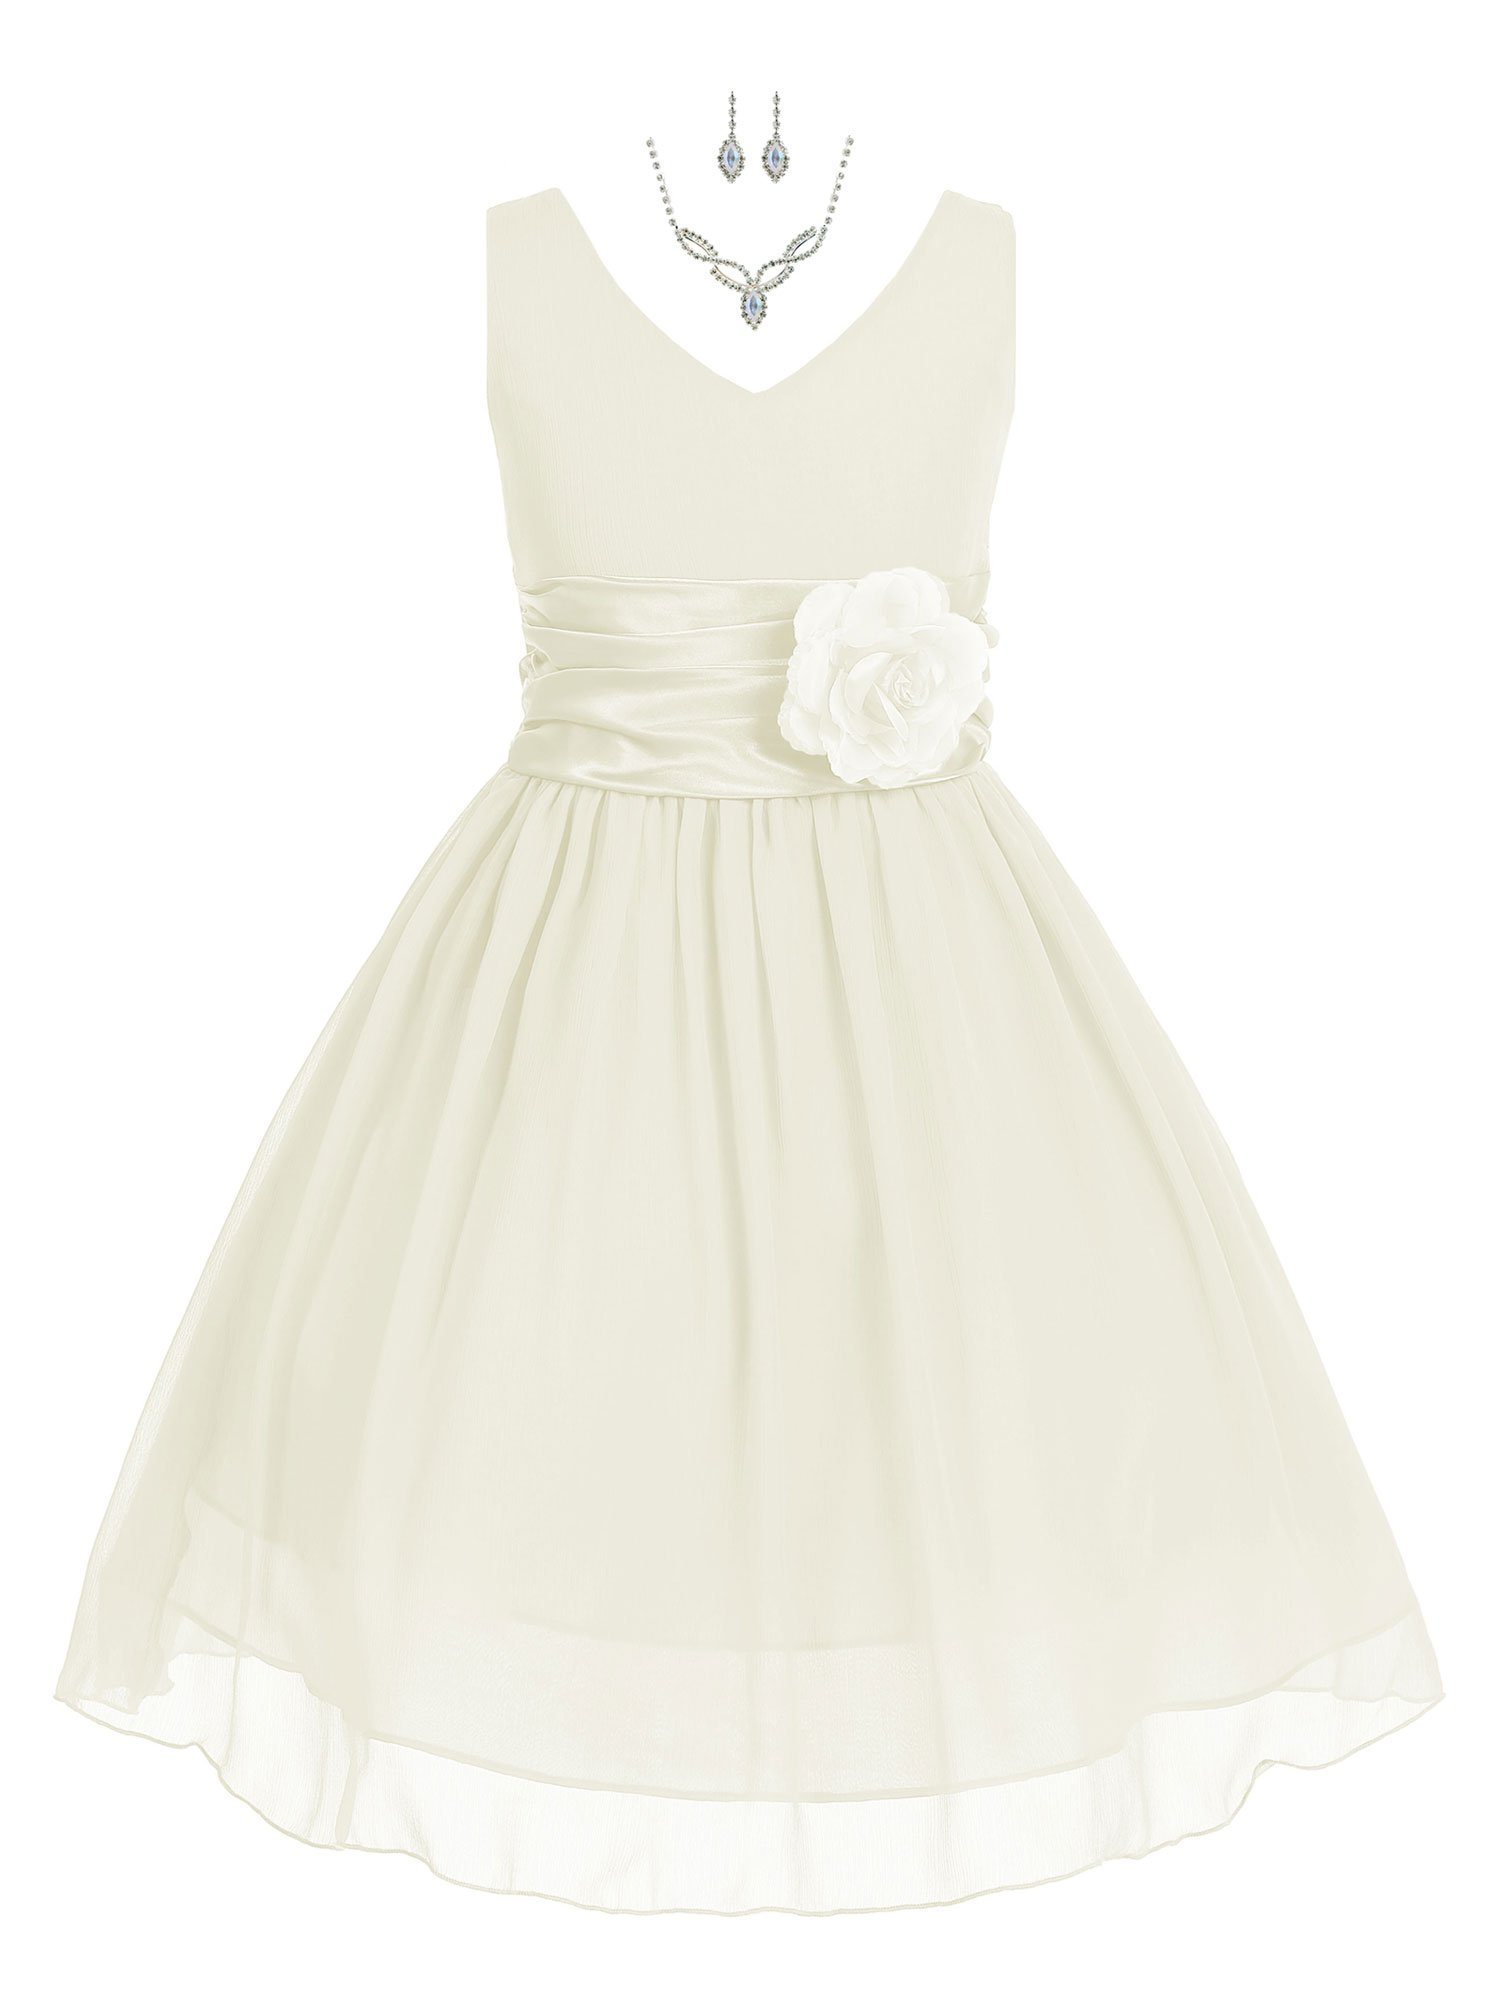 184641ba0a1 Bello Giovane Yoru Chiffon Flower Girl Dress with Free Necklace Set ...